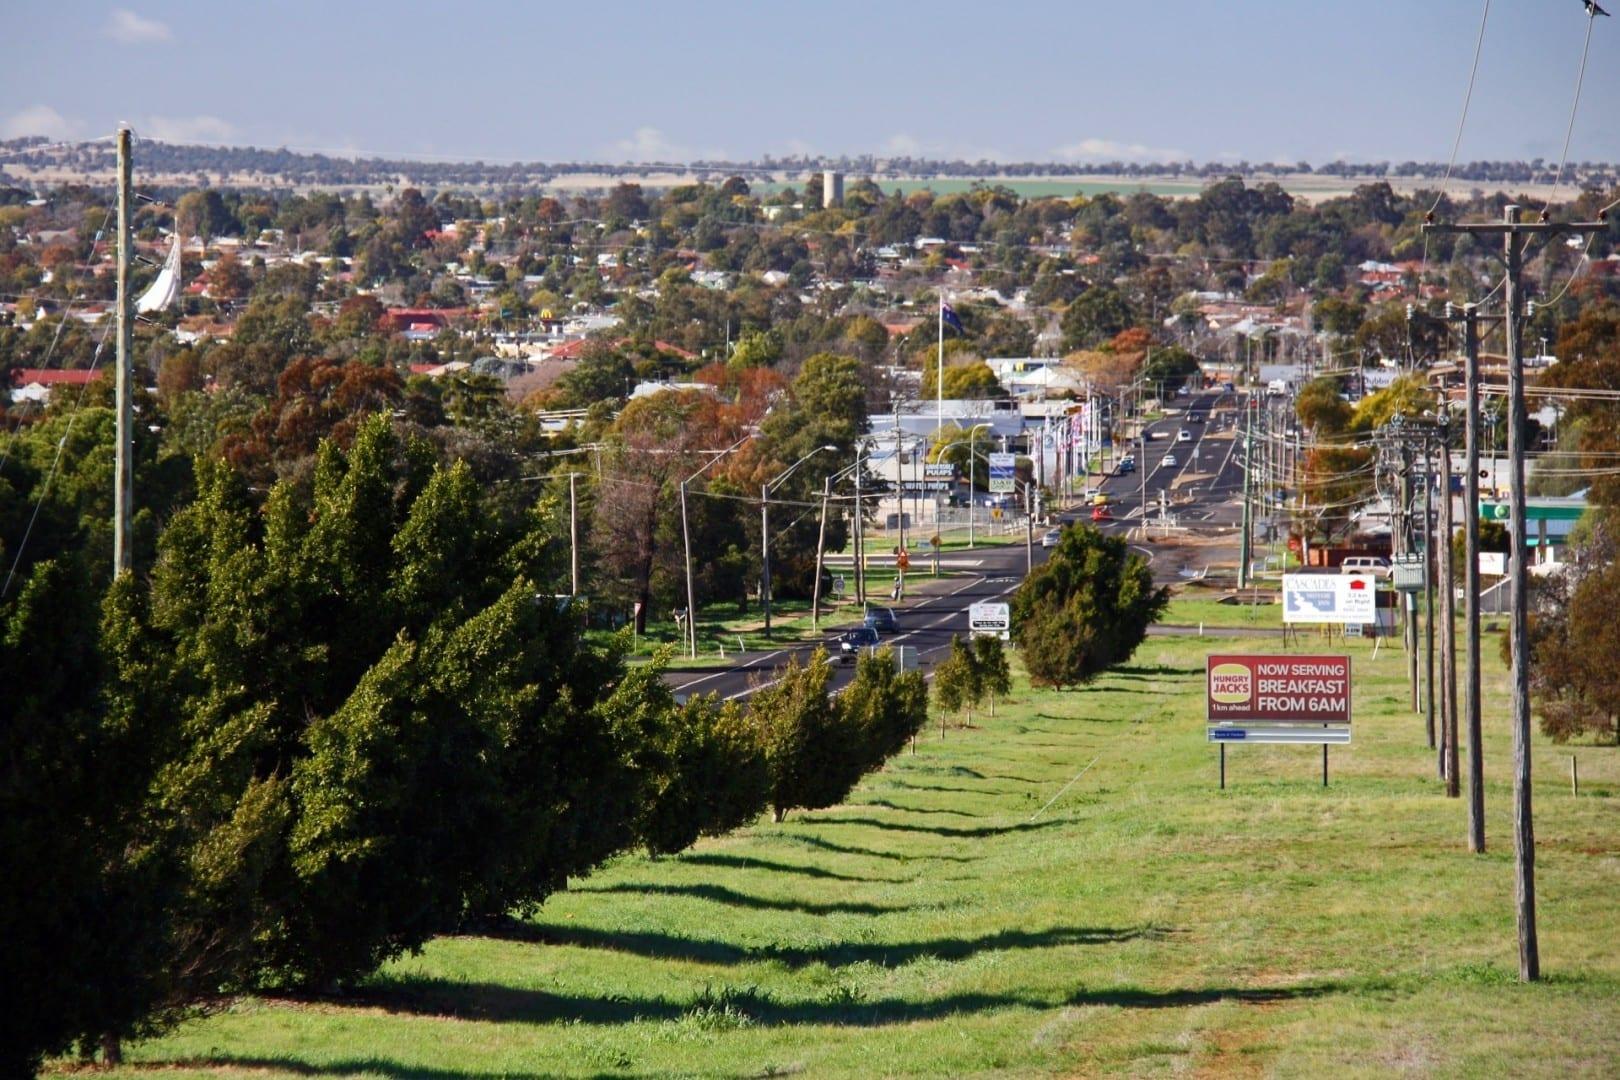 Vista de Dubbo desde el suburbio de West Dubbo Dubbo Australia